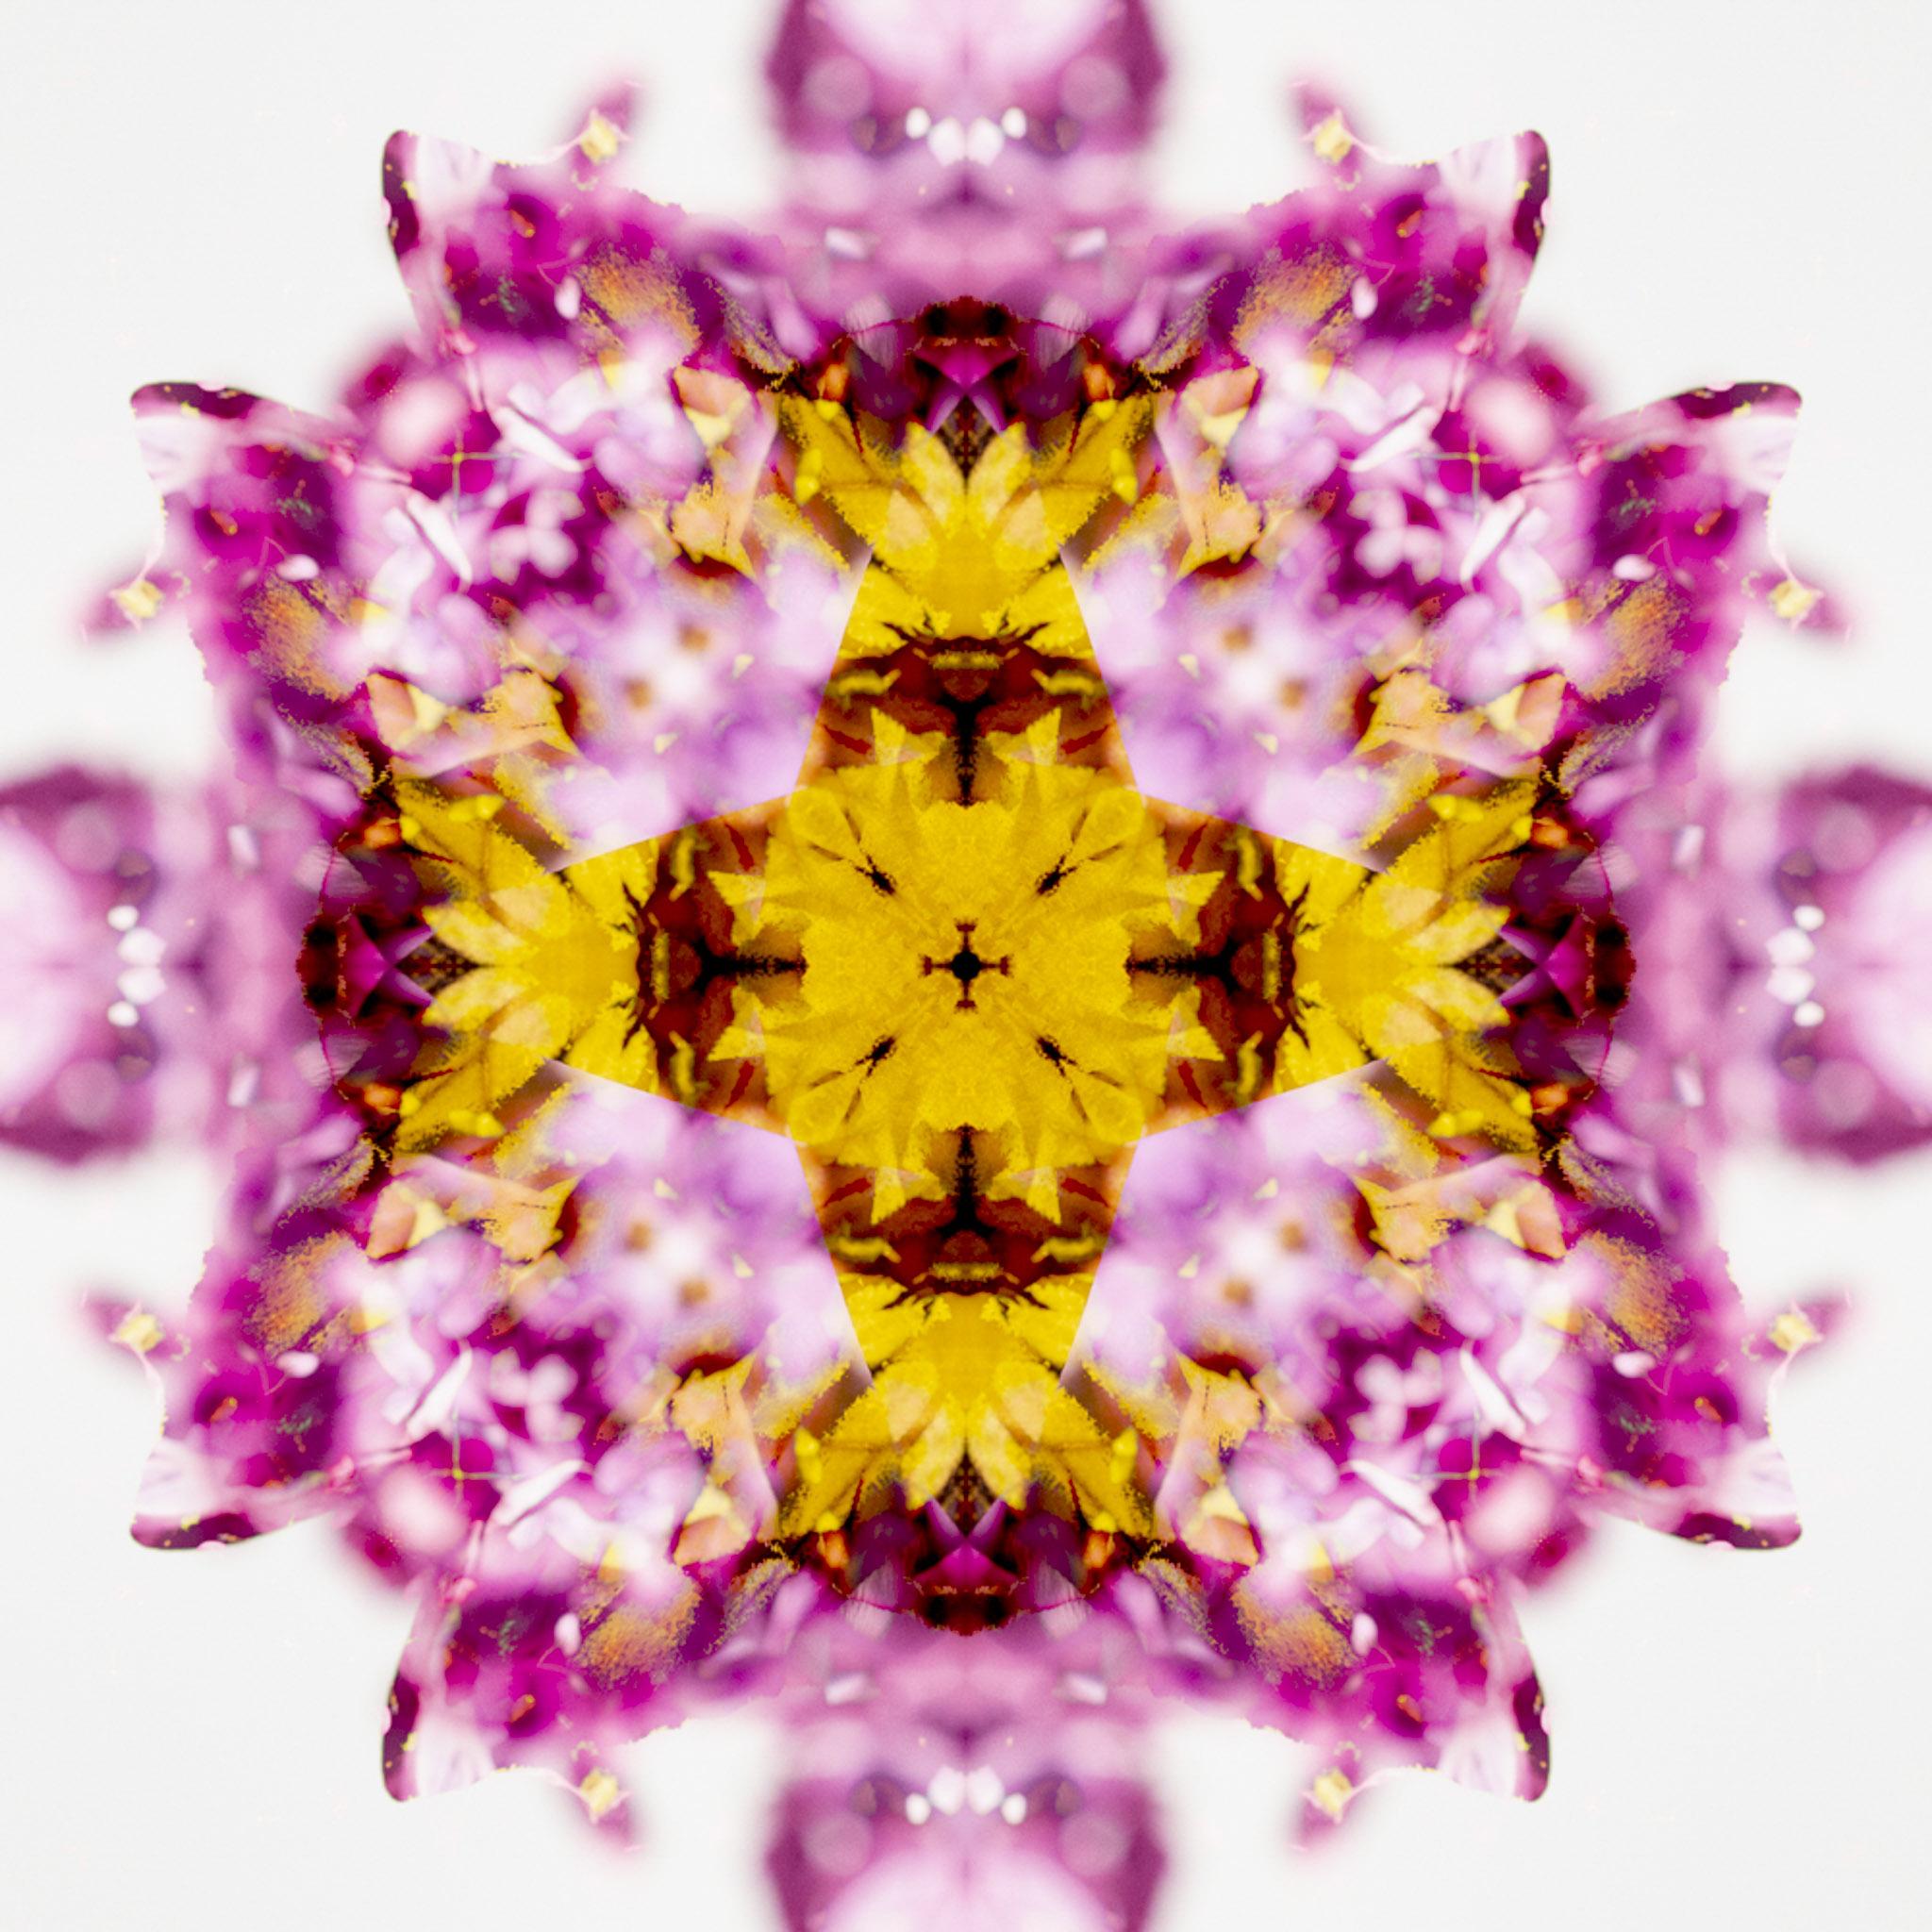 Mandala from Tiger Swallowtail on Lilac - DMH